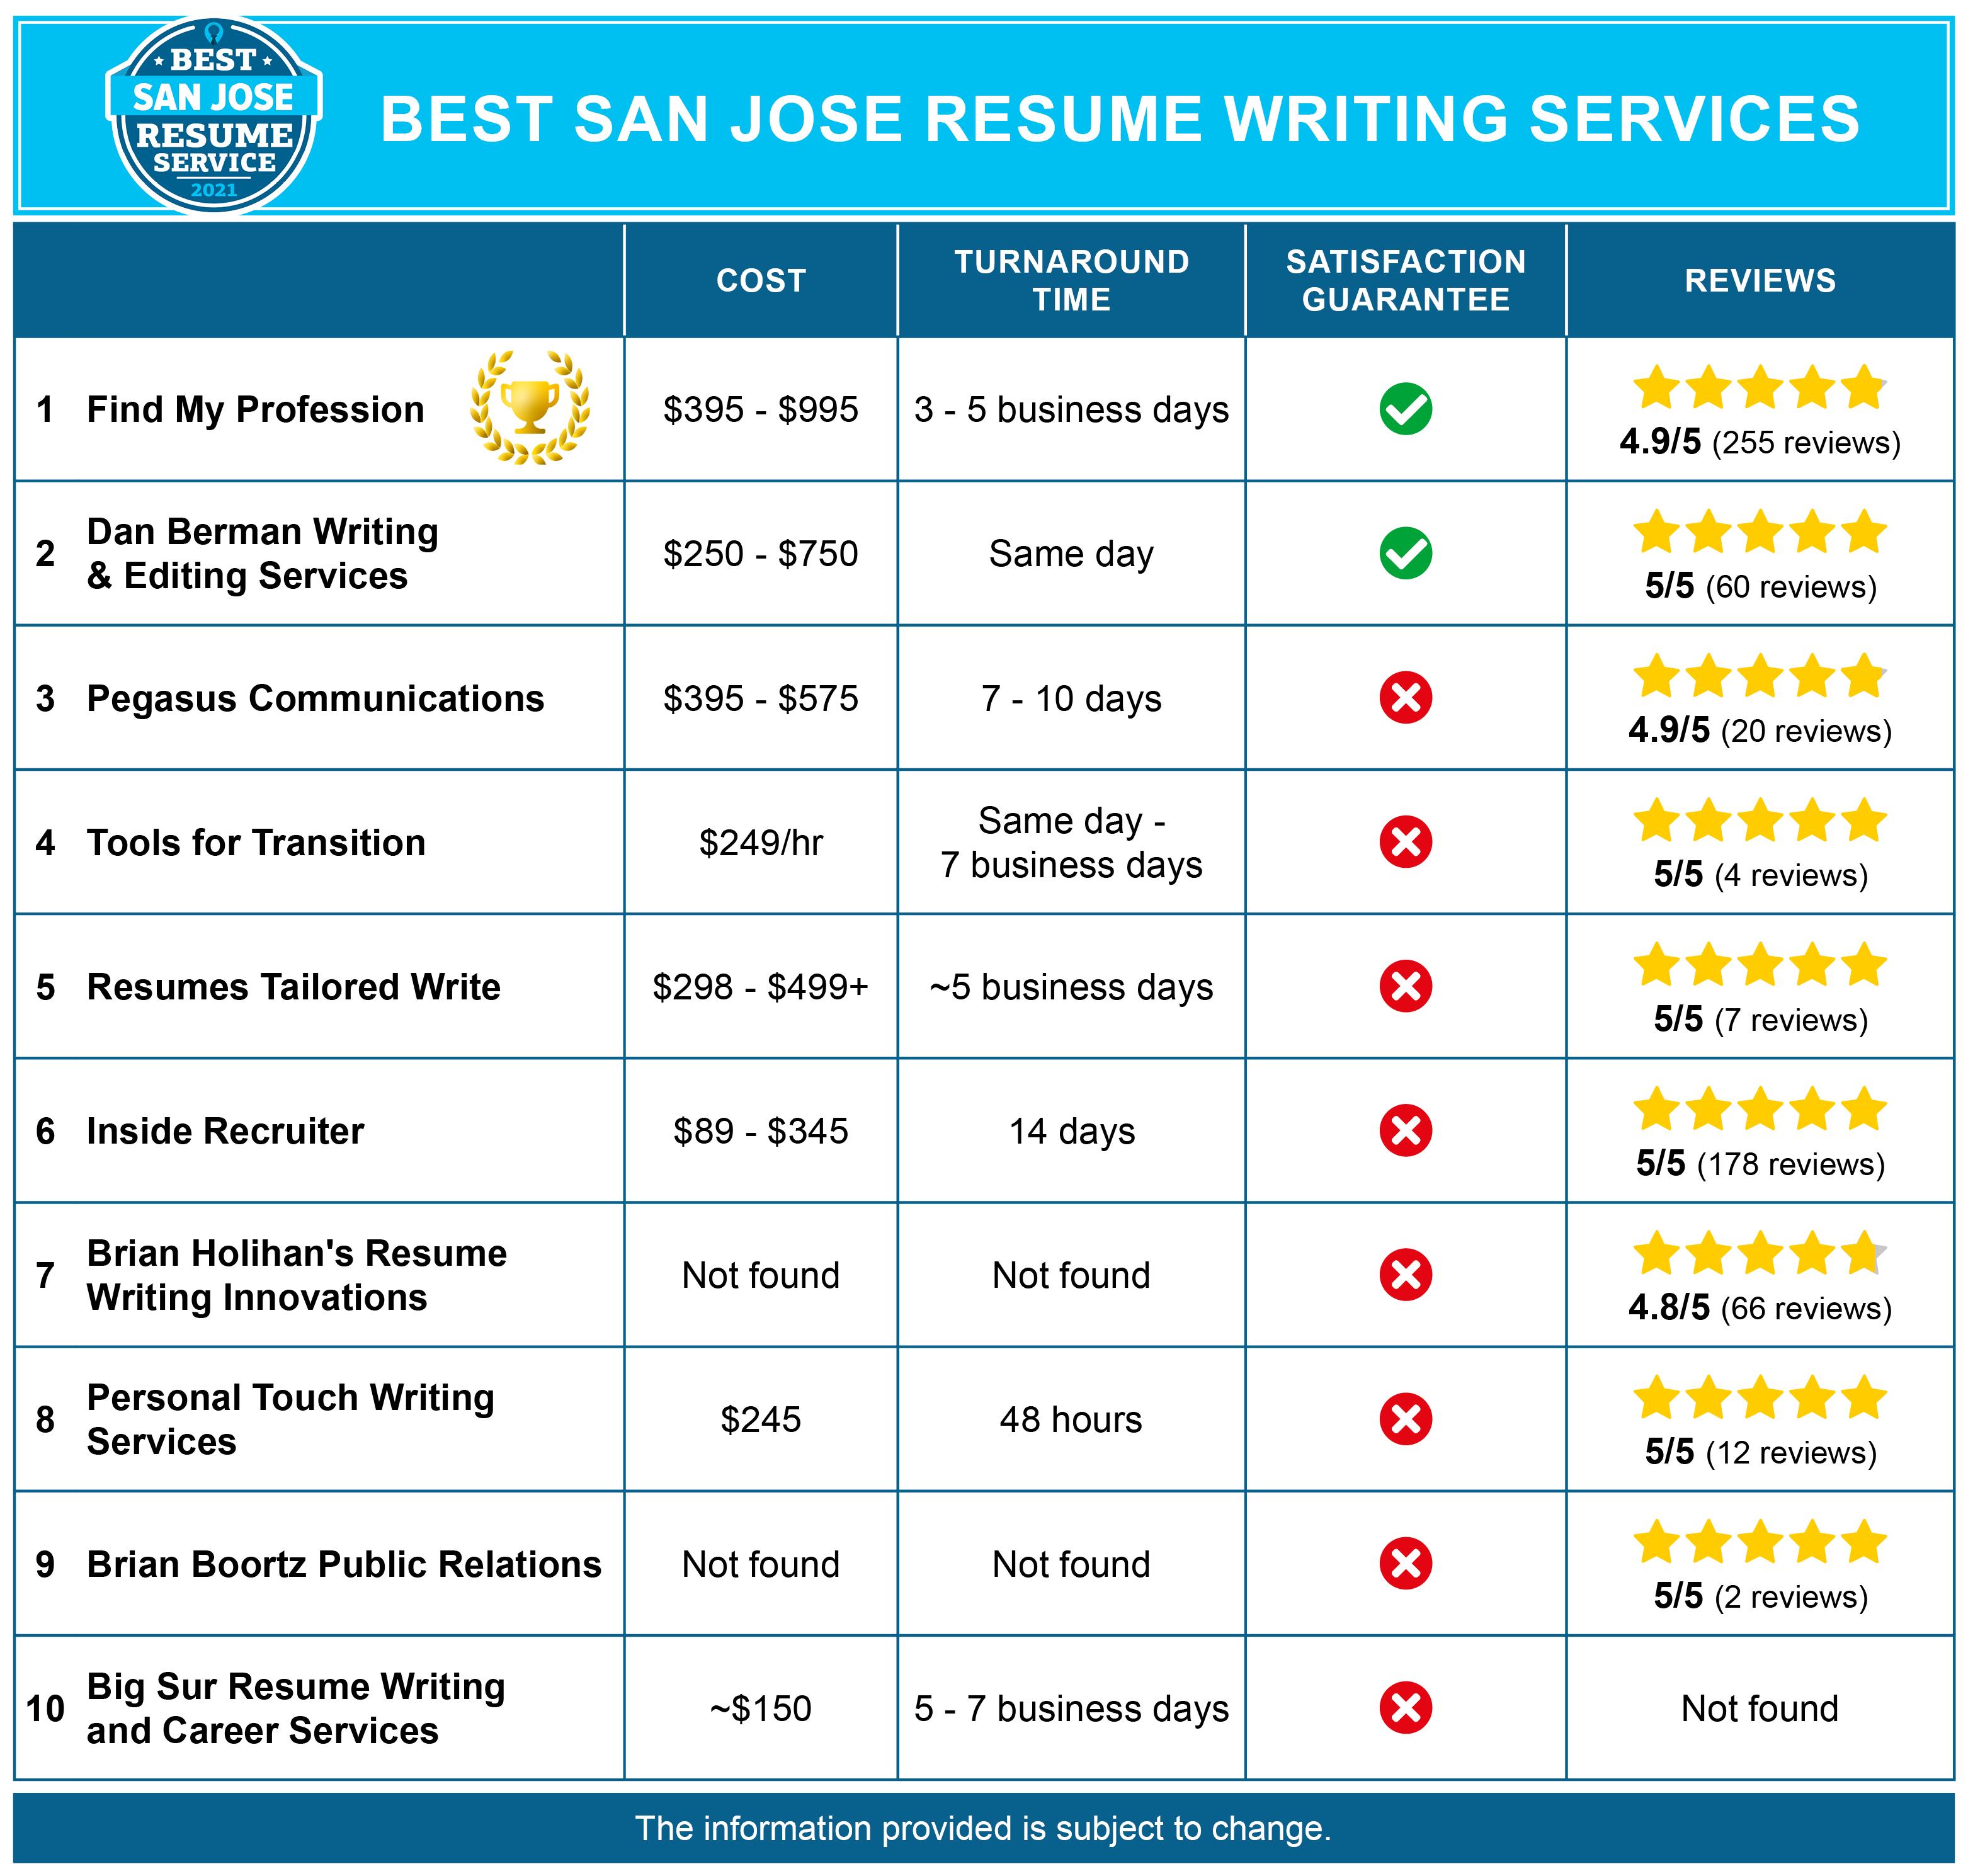 Best San Jose Resume Services